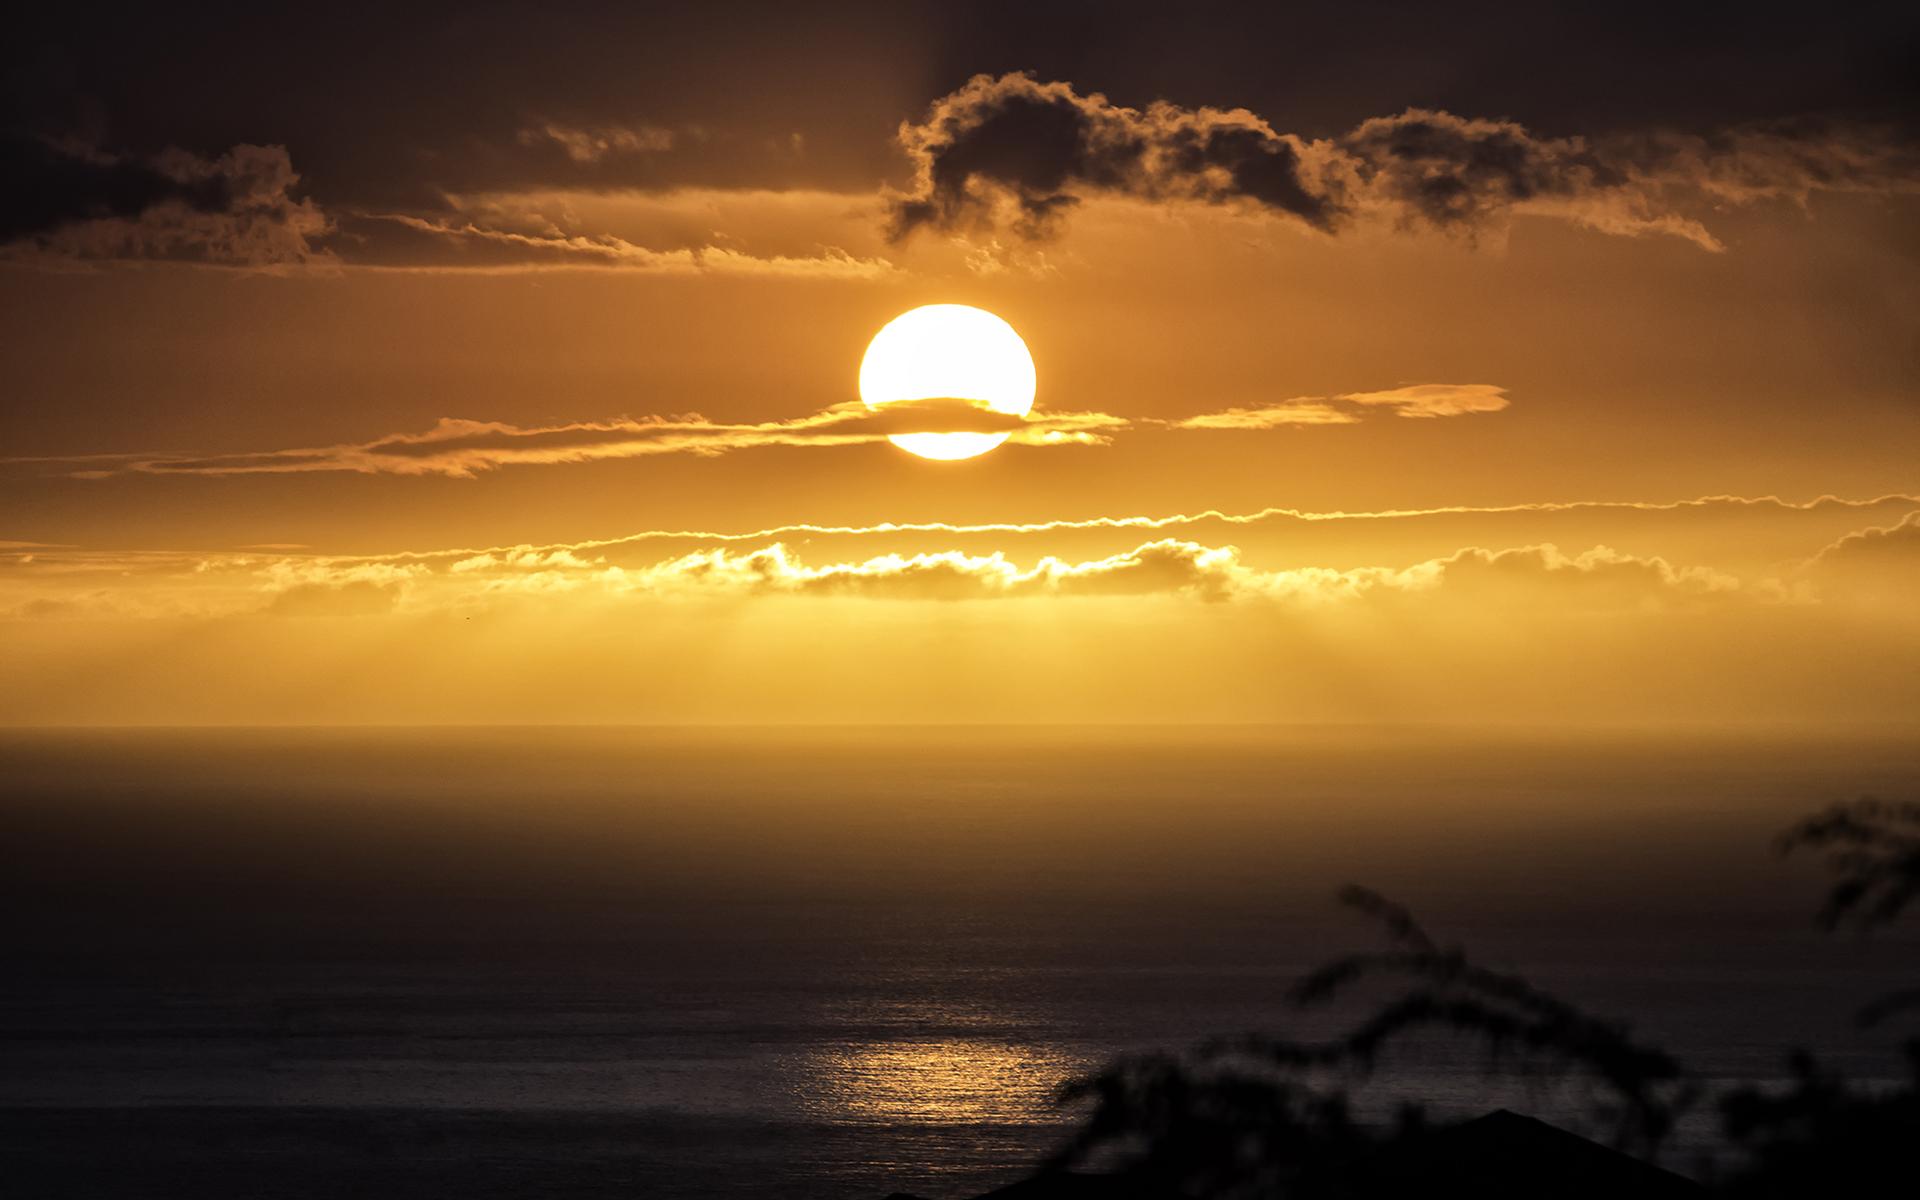 Wallpaper : 1920x1200 Px, Awan-awan, Api, Suasana Hati, Lautan, Refleksi,  Laut, Langit, Matahari, Sinar Matahari, Matahari Terbenam 1920x1200 -  Wallhaven - 1716705 - HD Wallpapers - WallHere